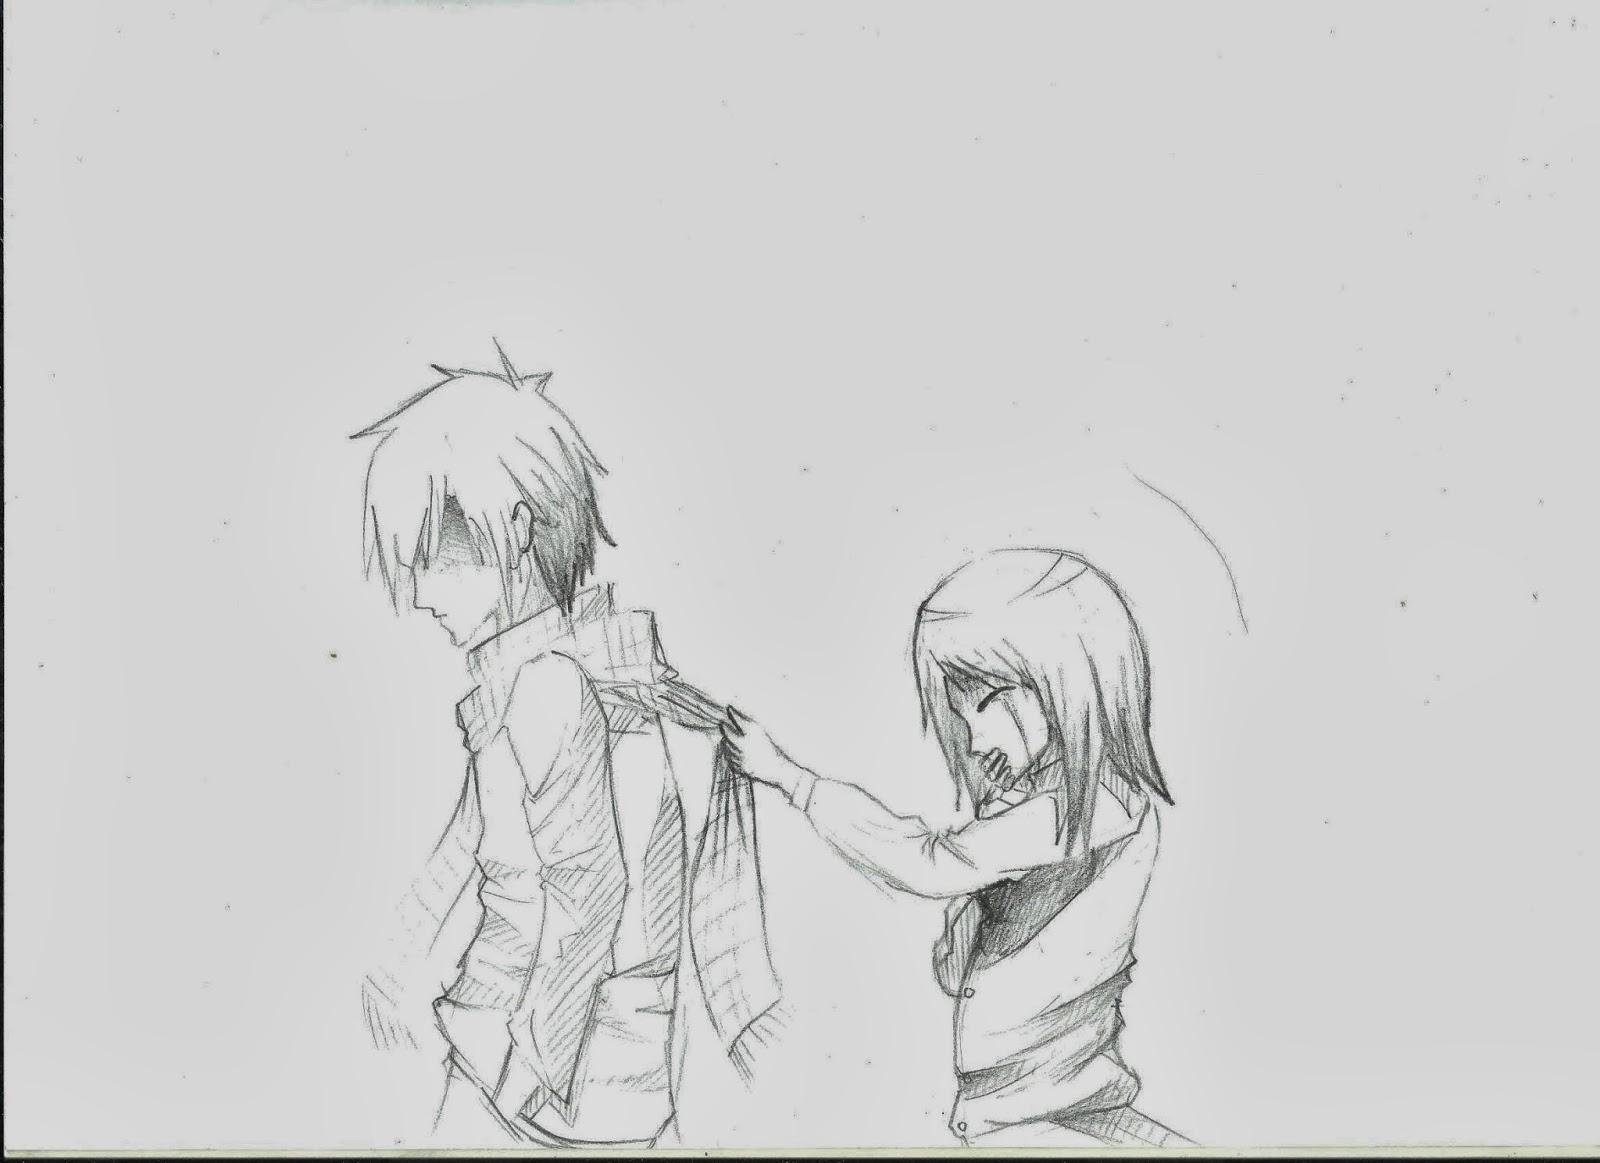 Gambar Anime Romantis Pensil Nusagates